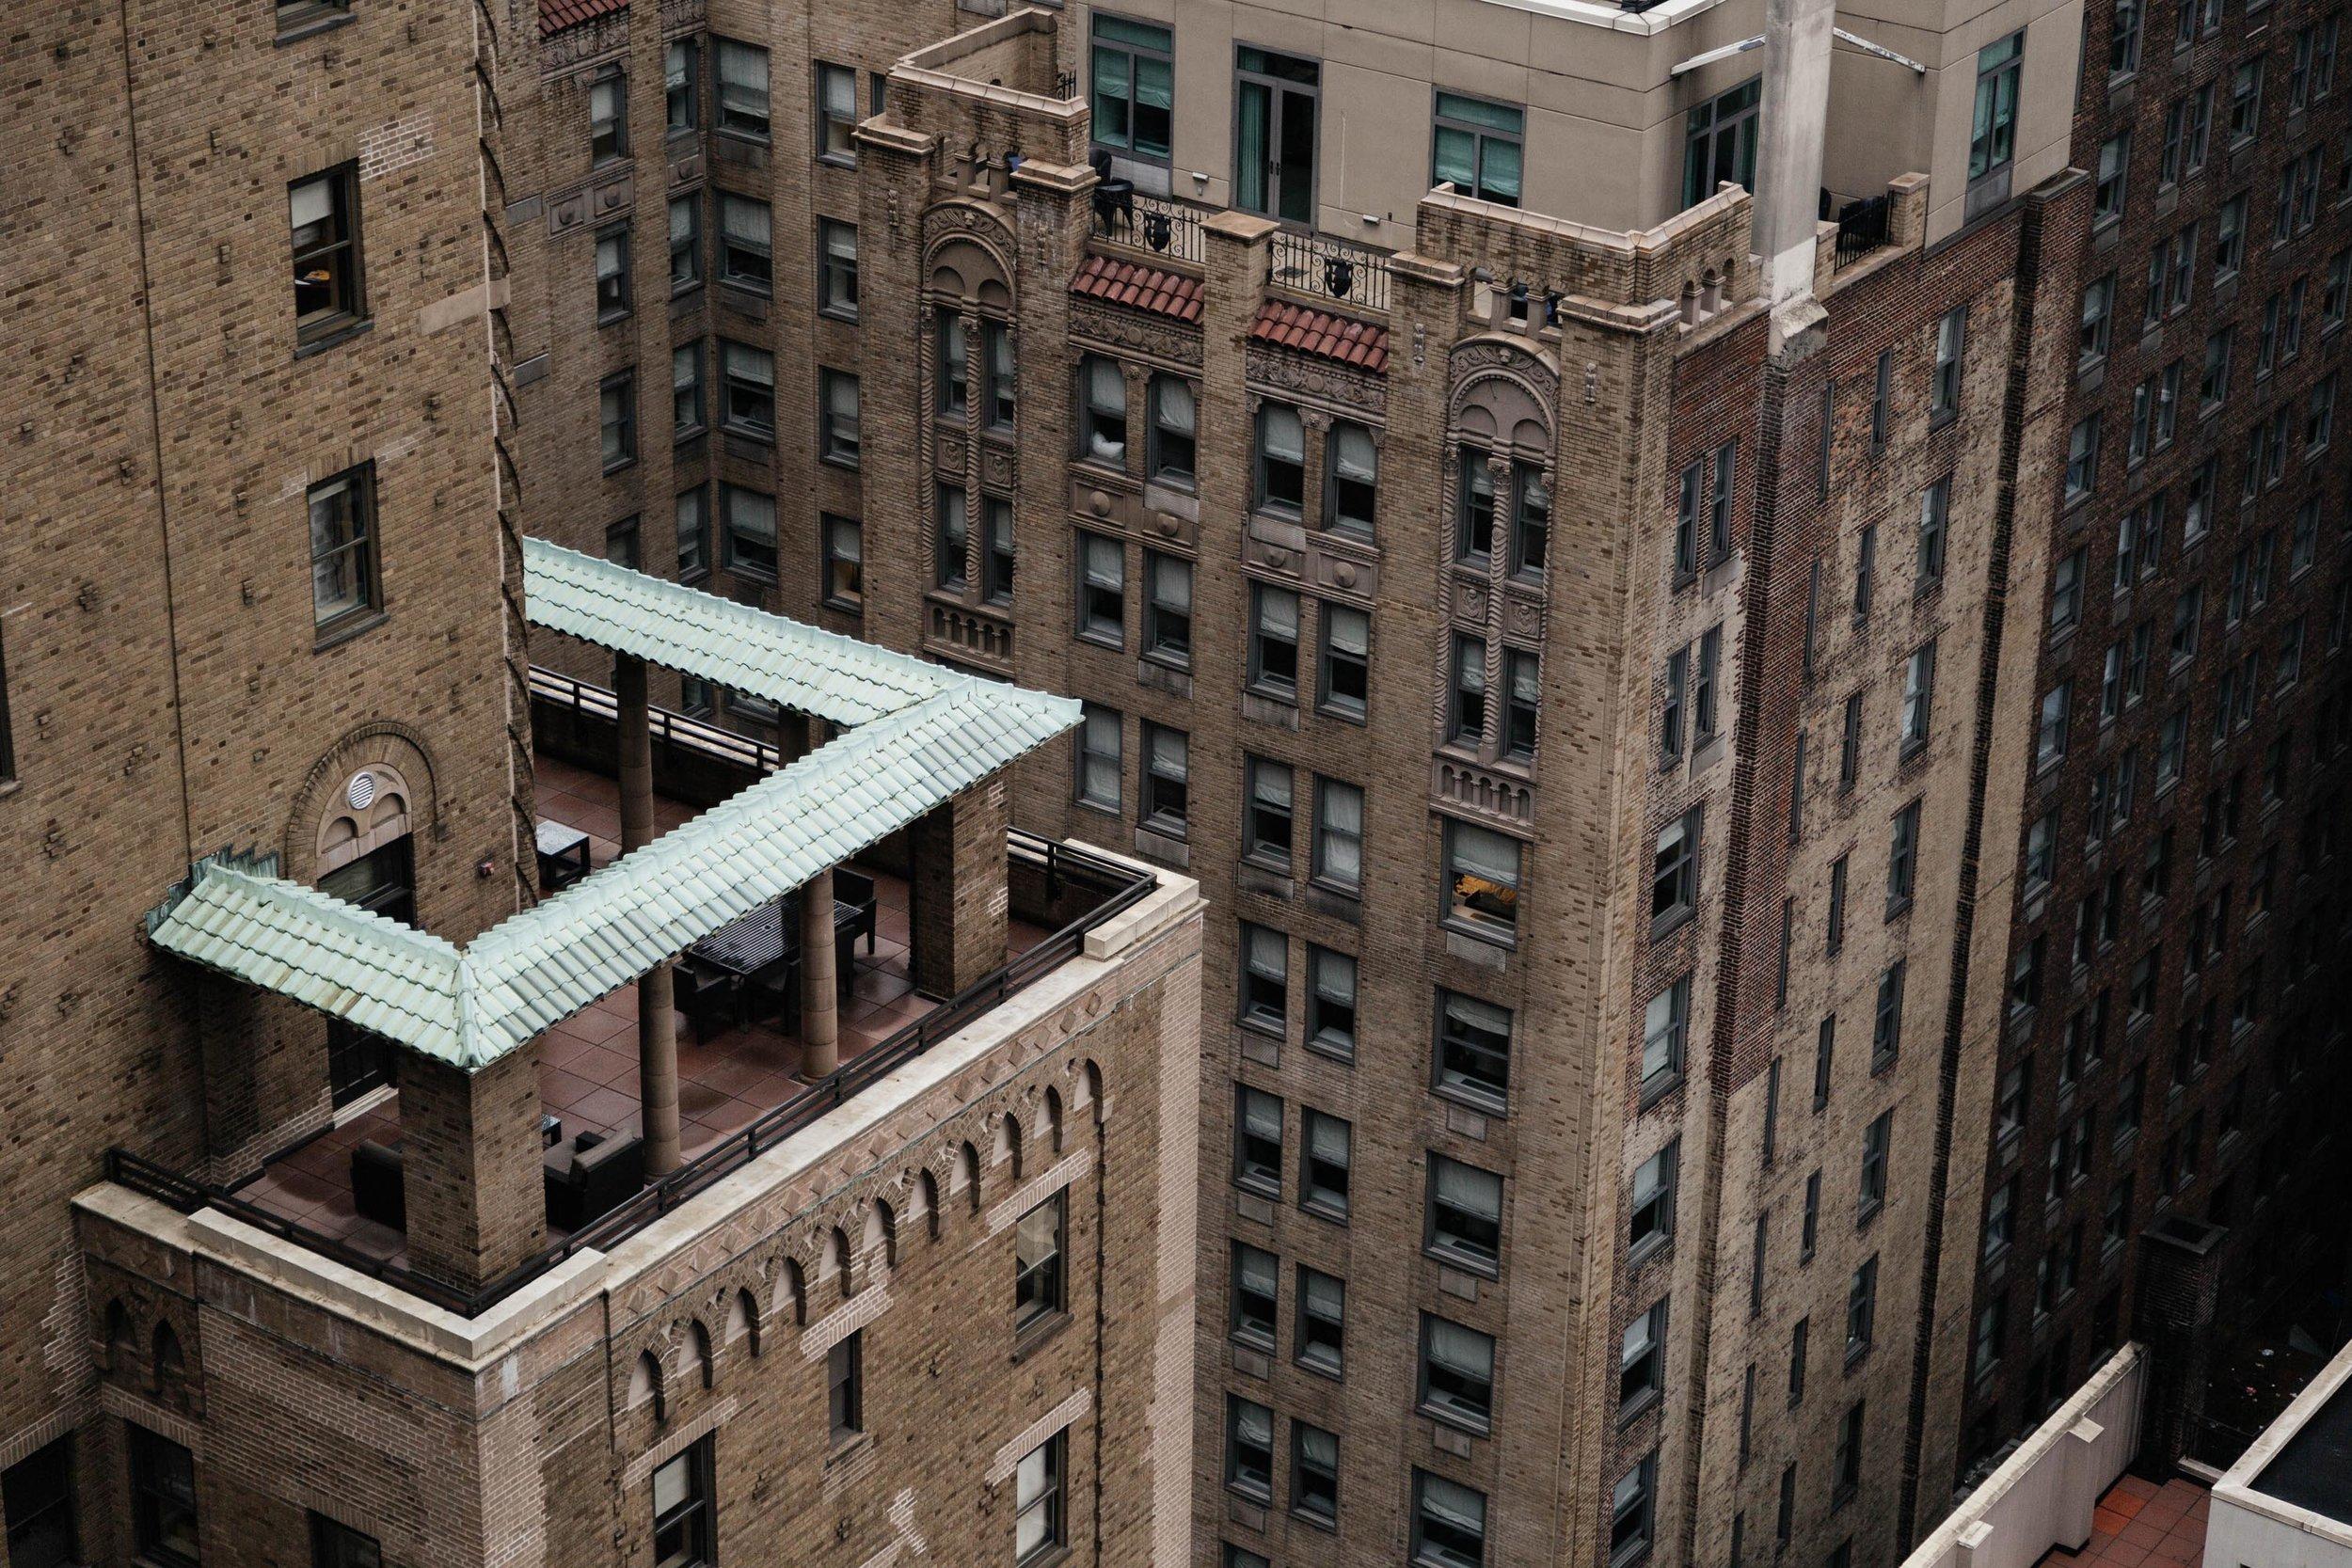 View of New York City brick buildings